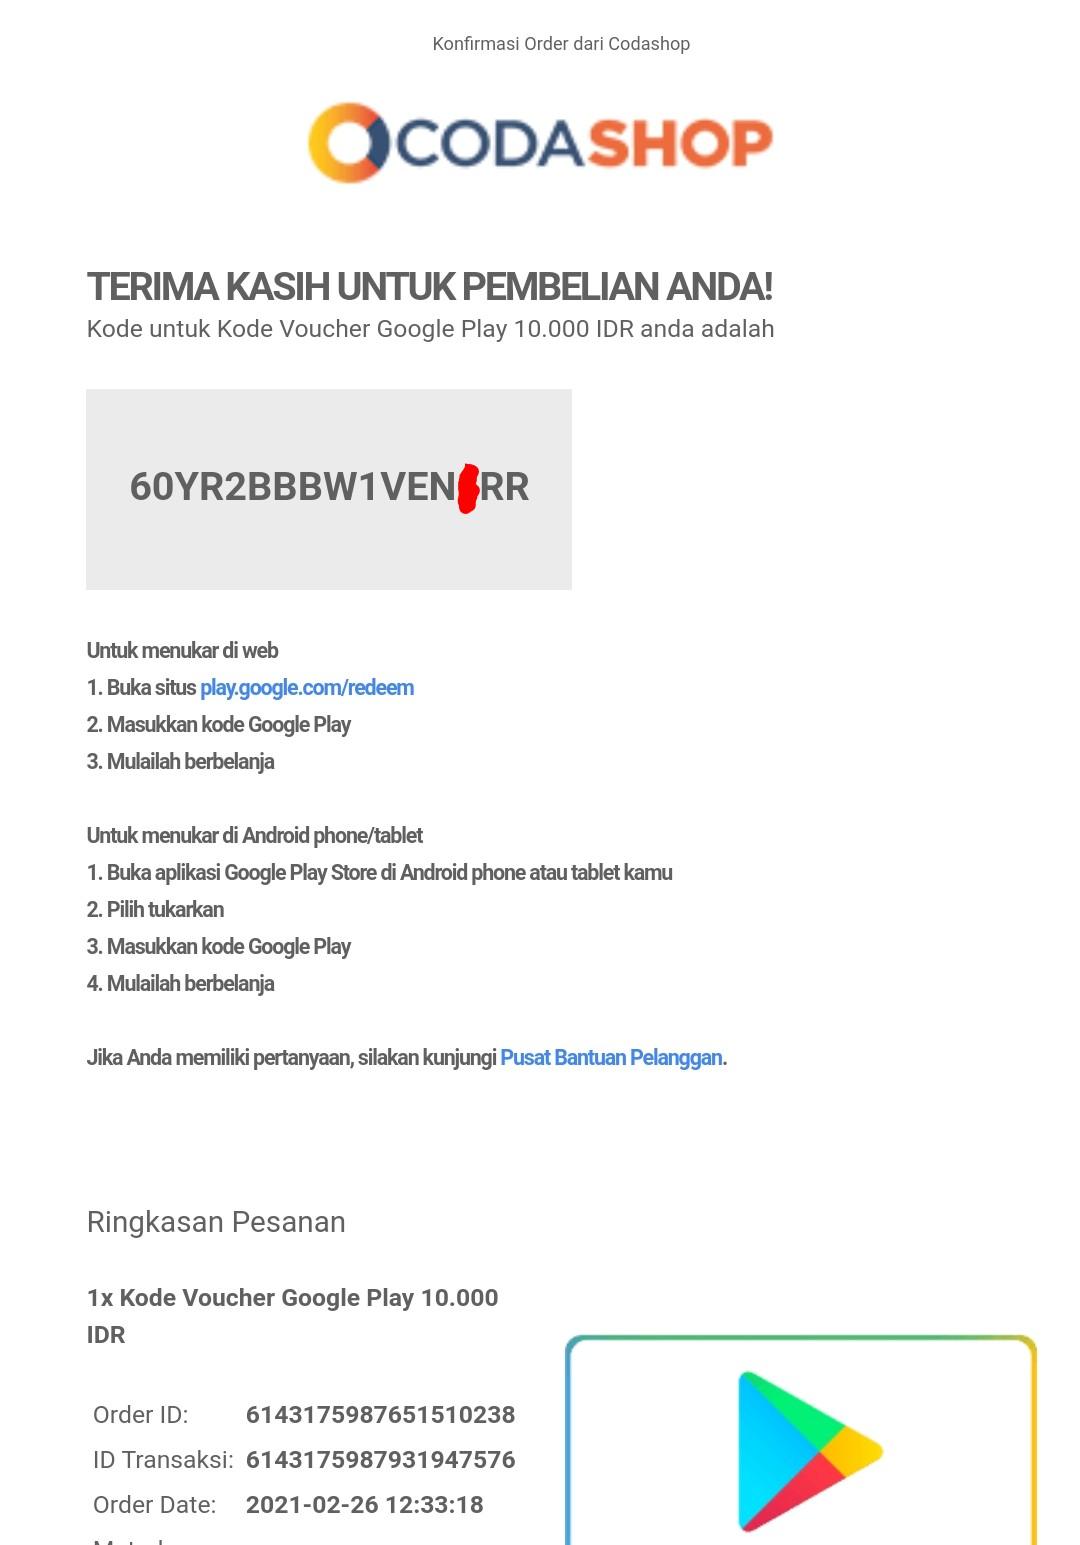 Kode Voucher Google Play Gratis Langsung Redeem 2021 Tukangoprek